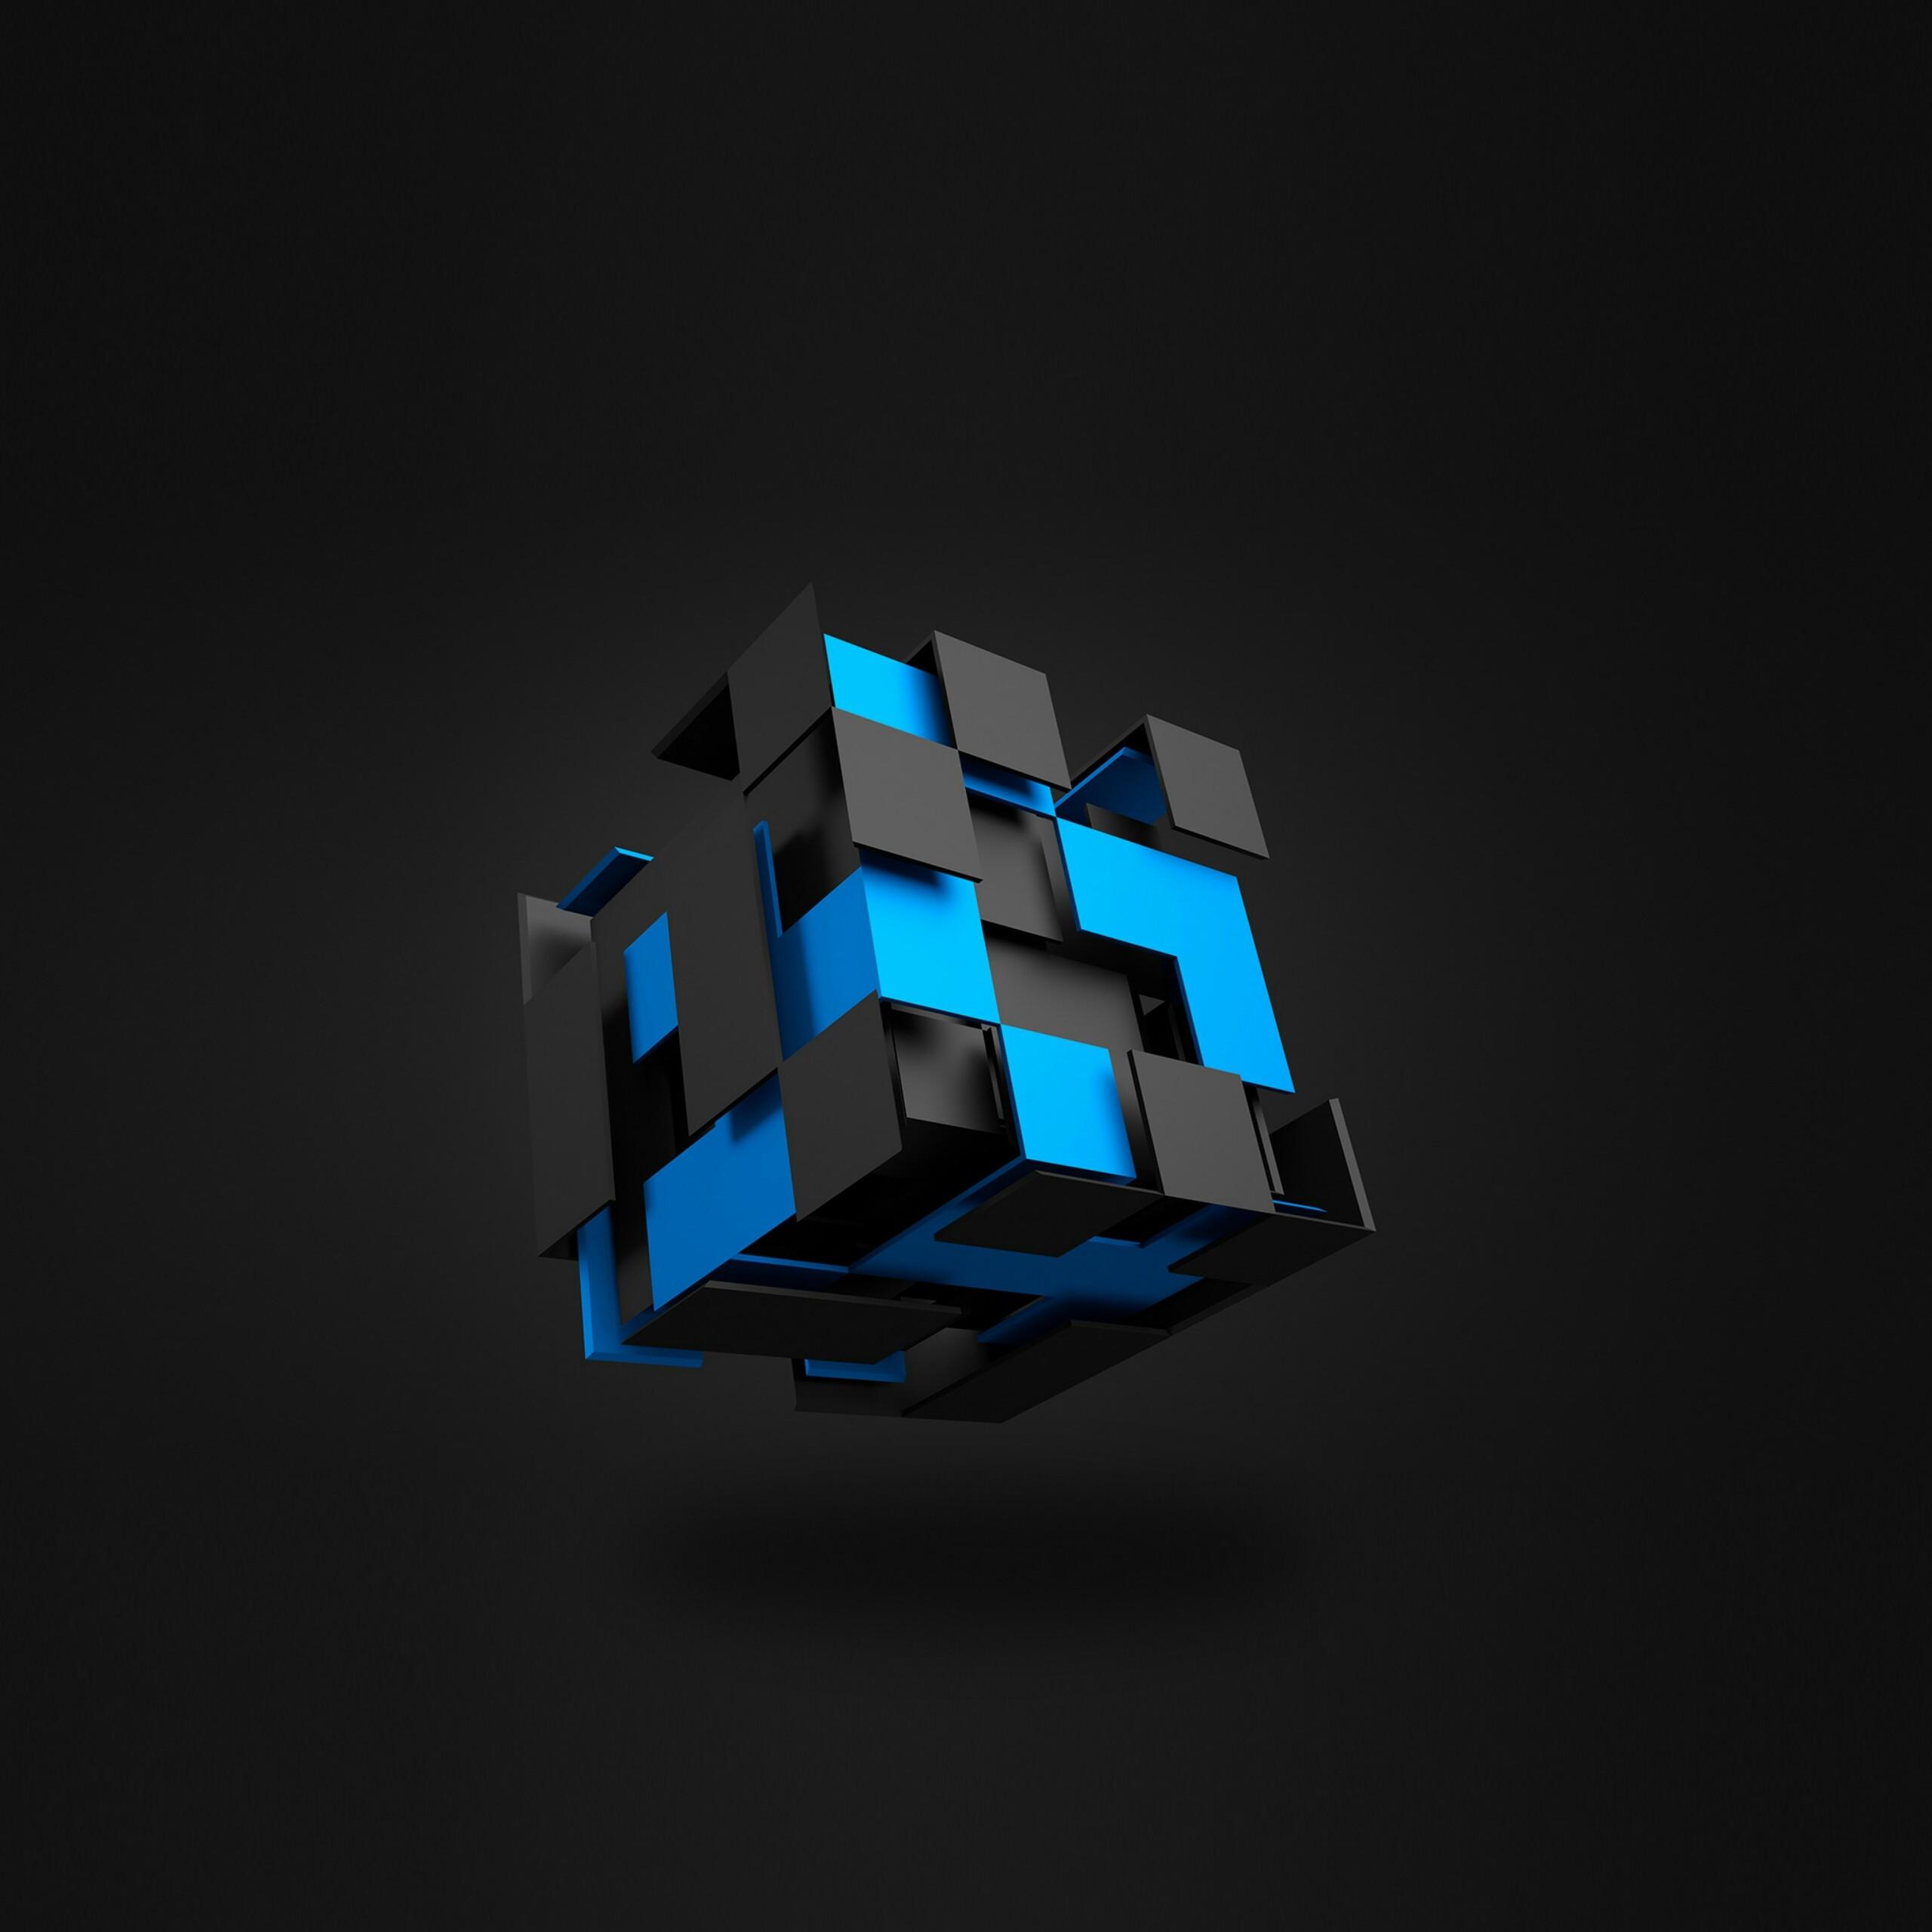 Unduh 95 Background Black Blue Hd Gratis Terbaru